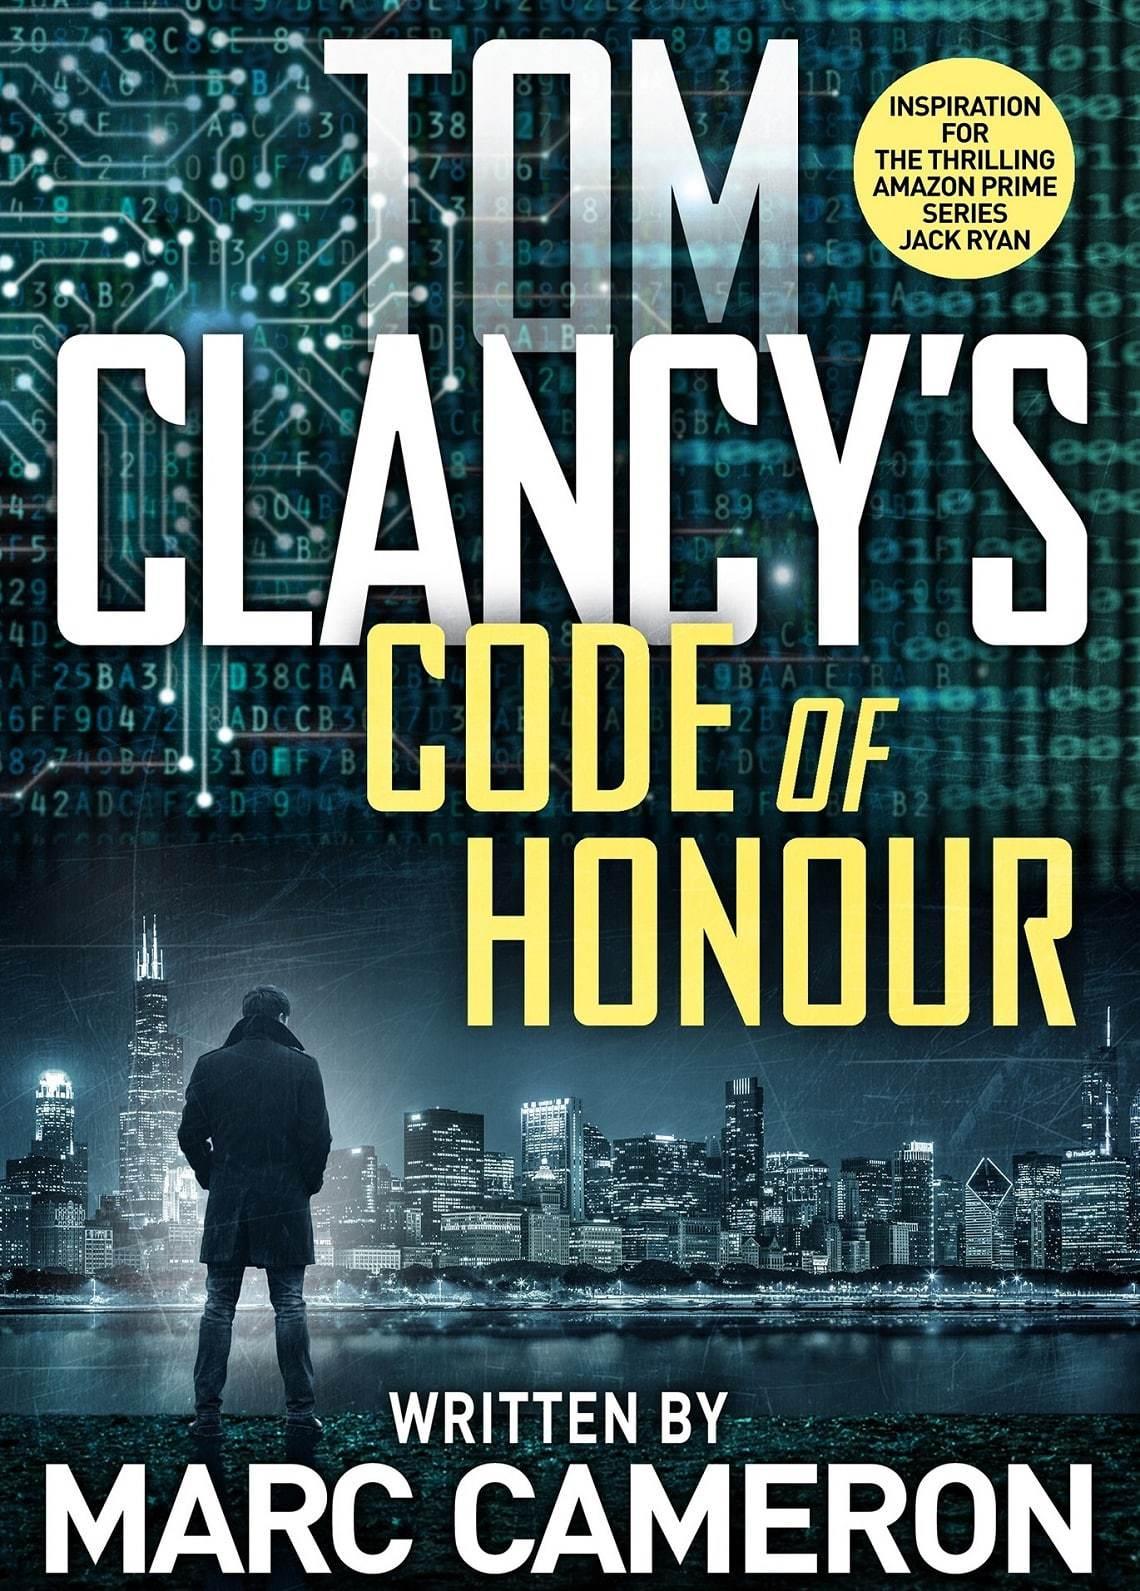 Tom Clancy Code of Honor Audiobook Free Download